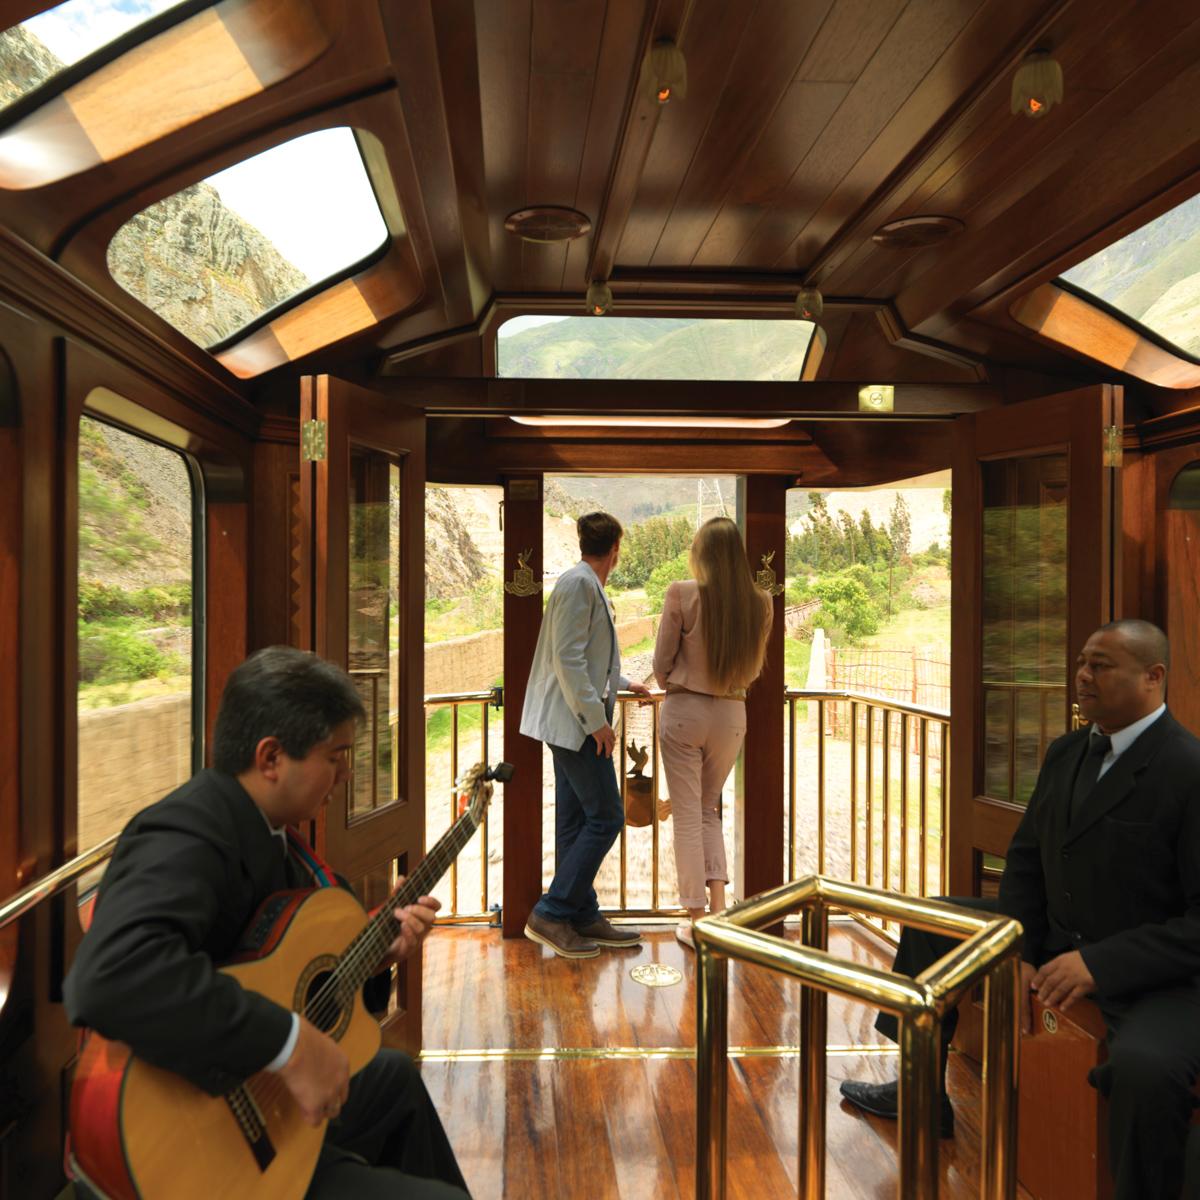 Belmond Hiram Bingham – Mit dem Zug zum Machu Picchu-3